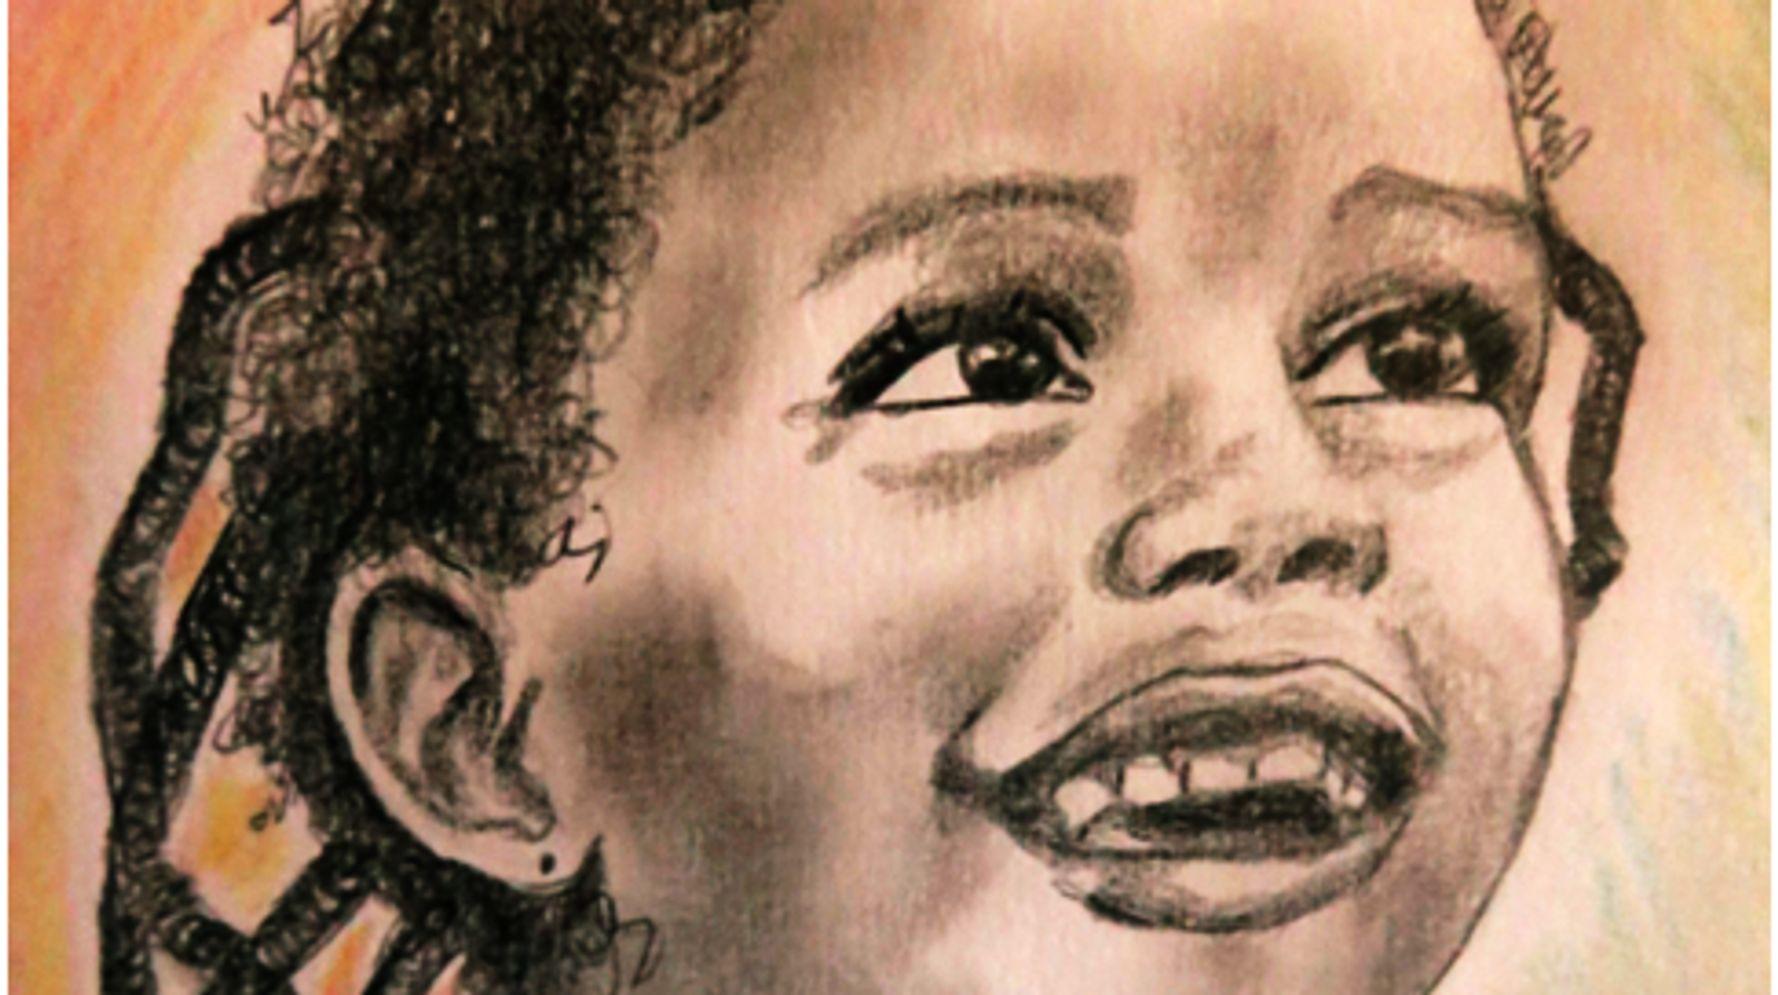 An HIV Nurse Shares Her Patients' Stories Through Art